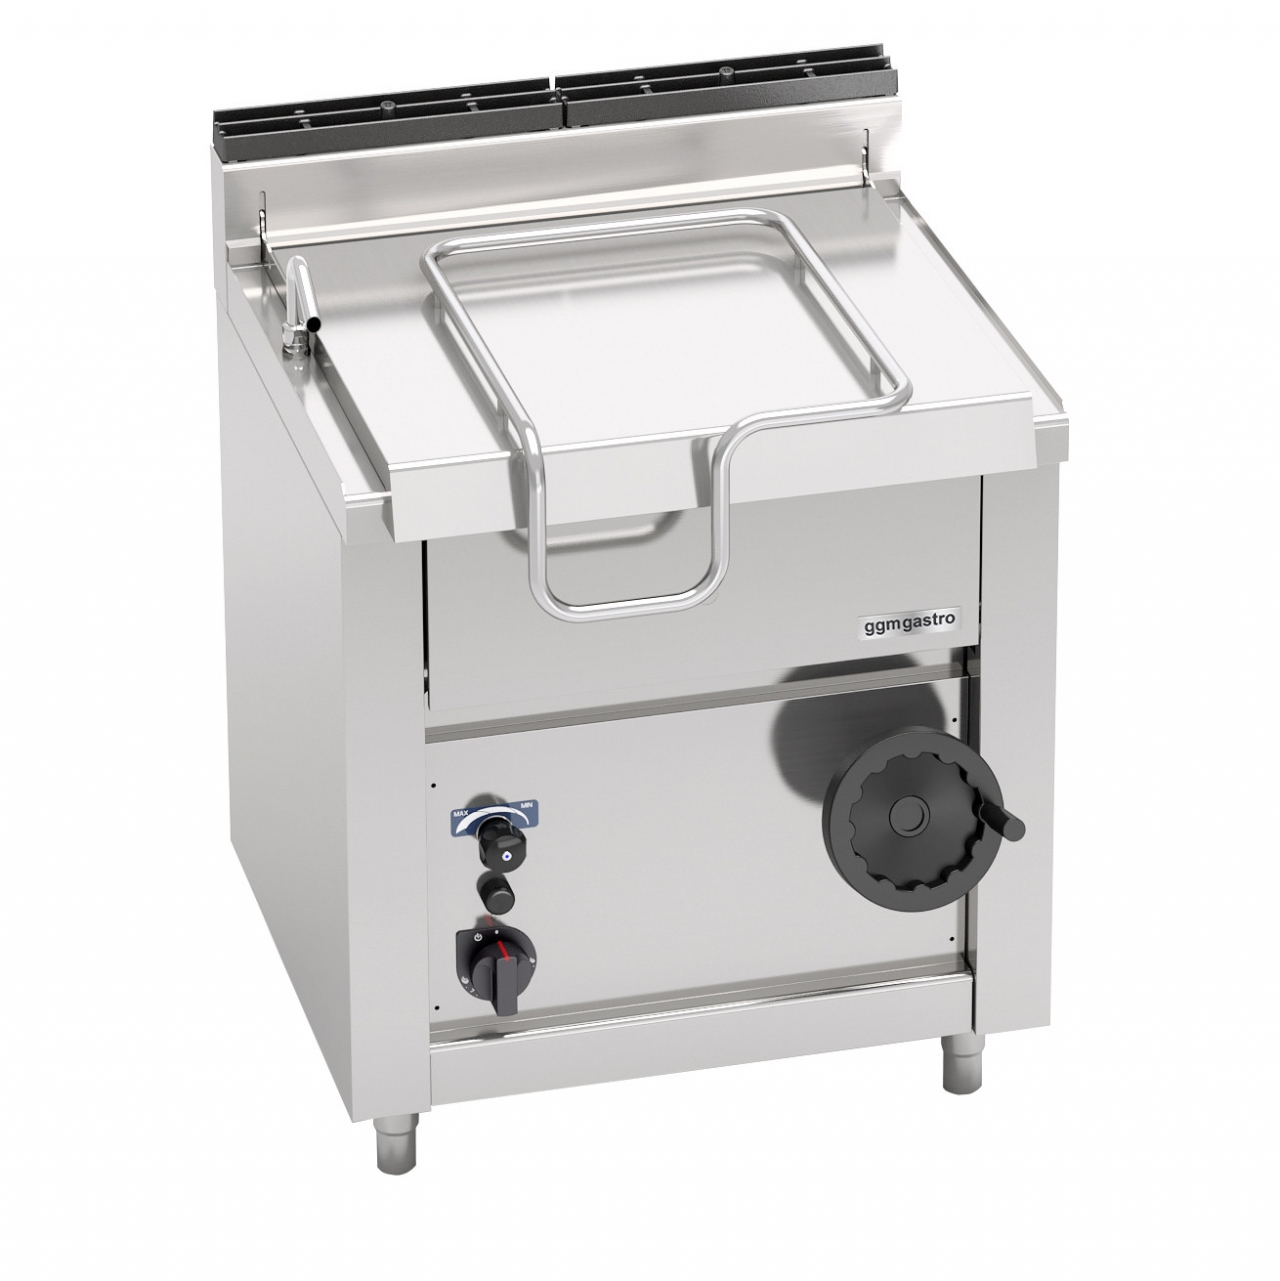 Frying pan gas 60L 14.5kW